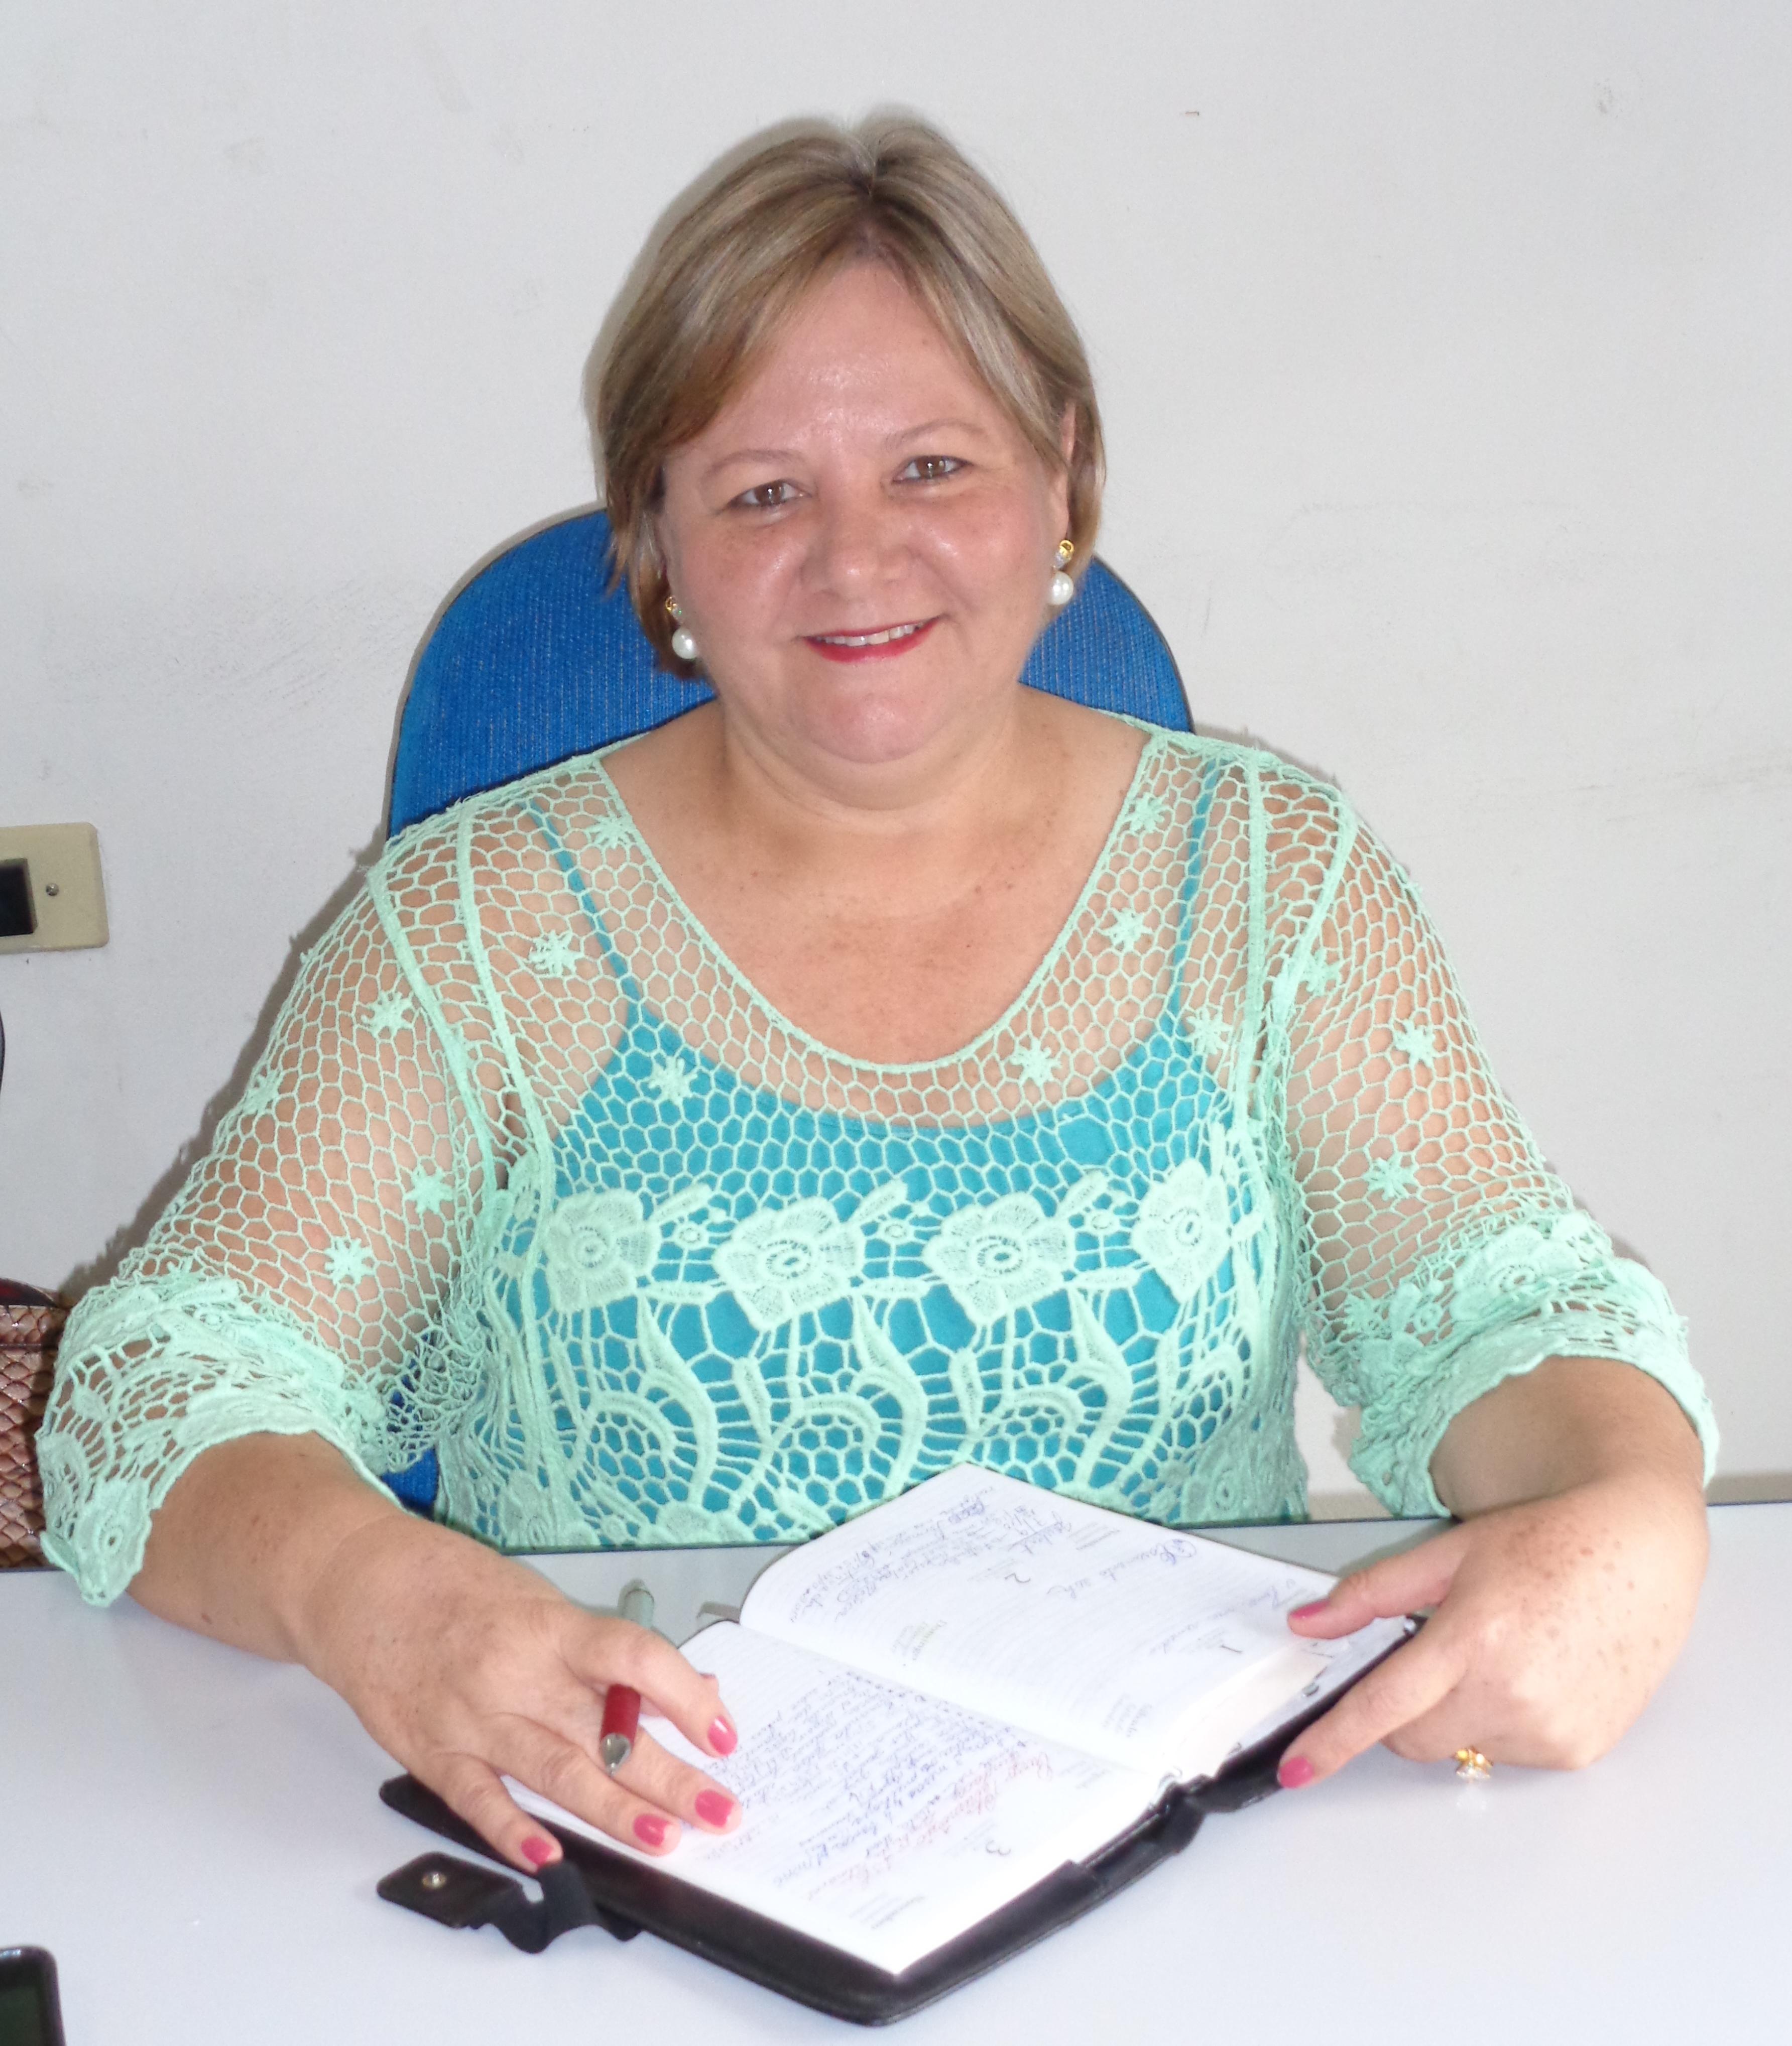 Iracilda Duarte